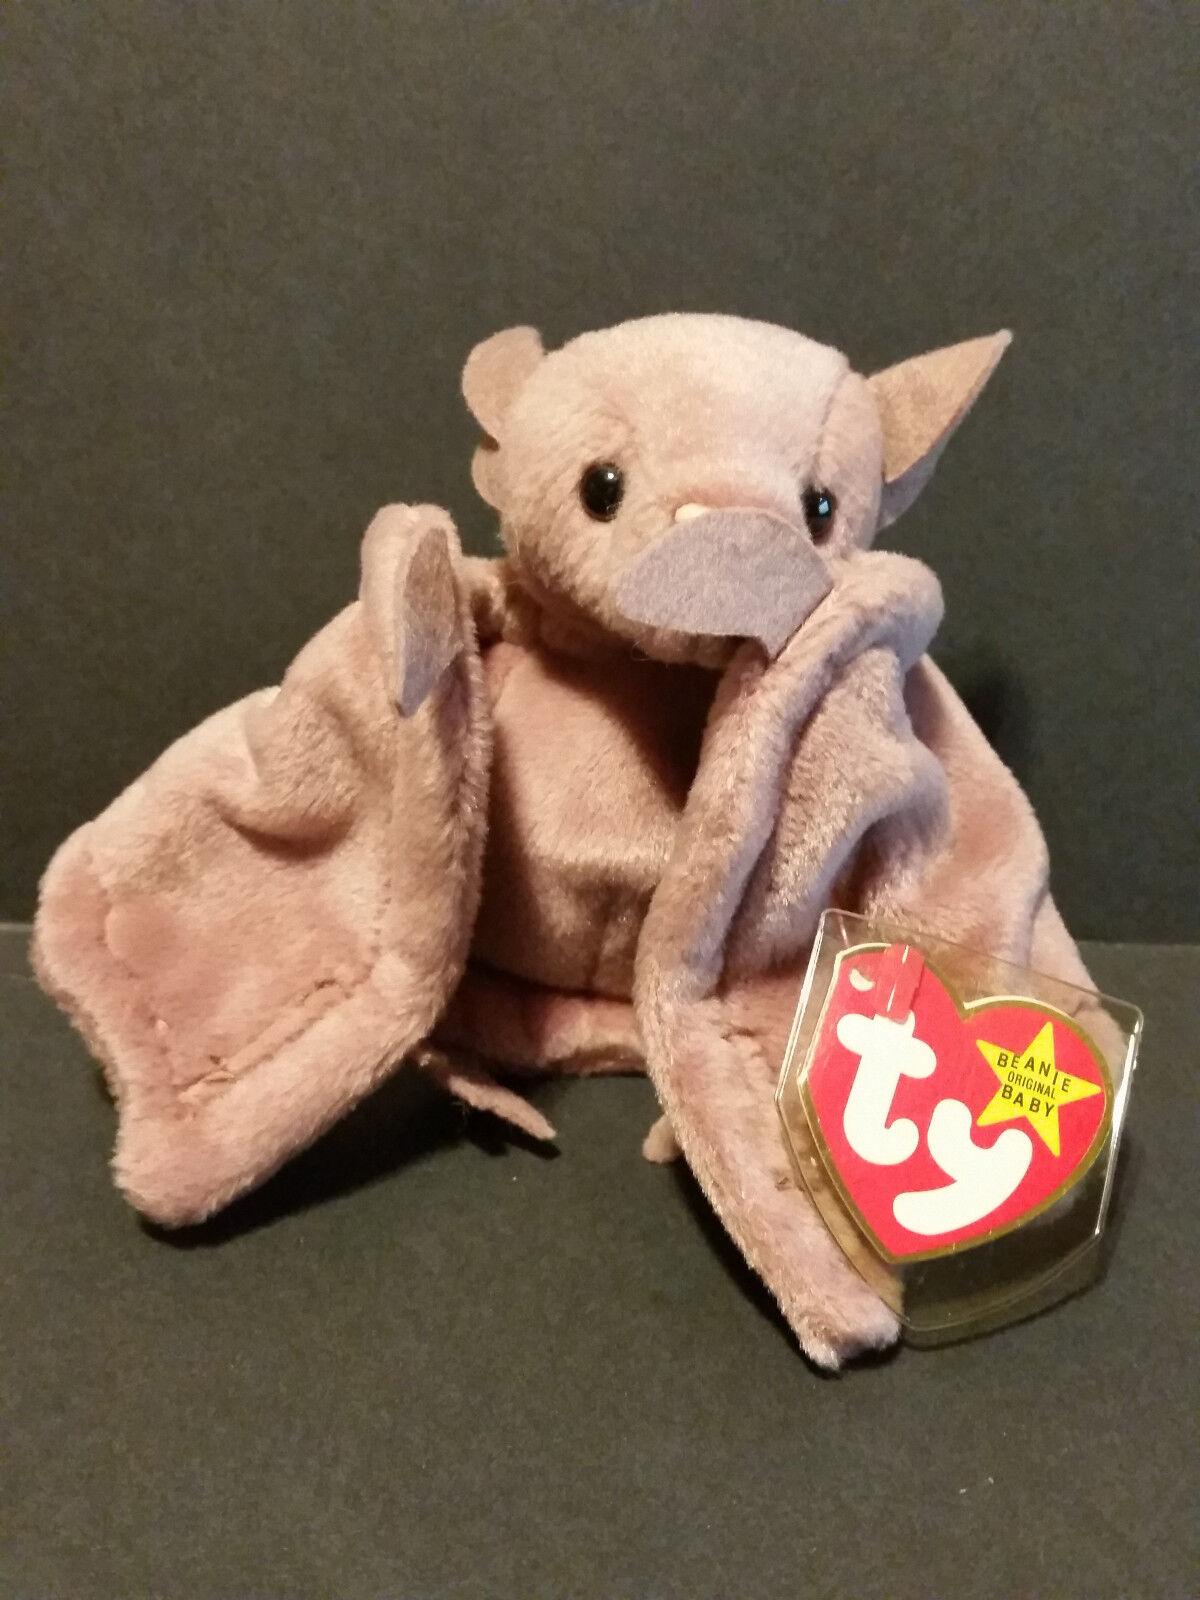 1996 Ty Beanie Baby Batty the Bat W  Tag PVC Pellets